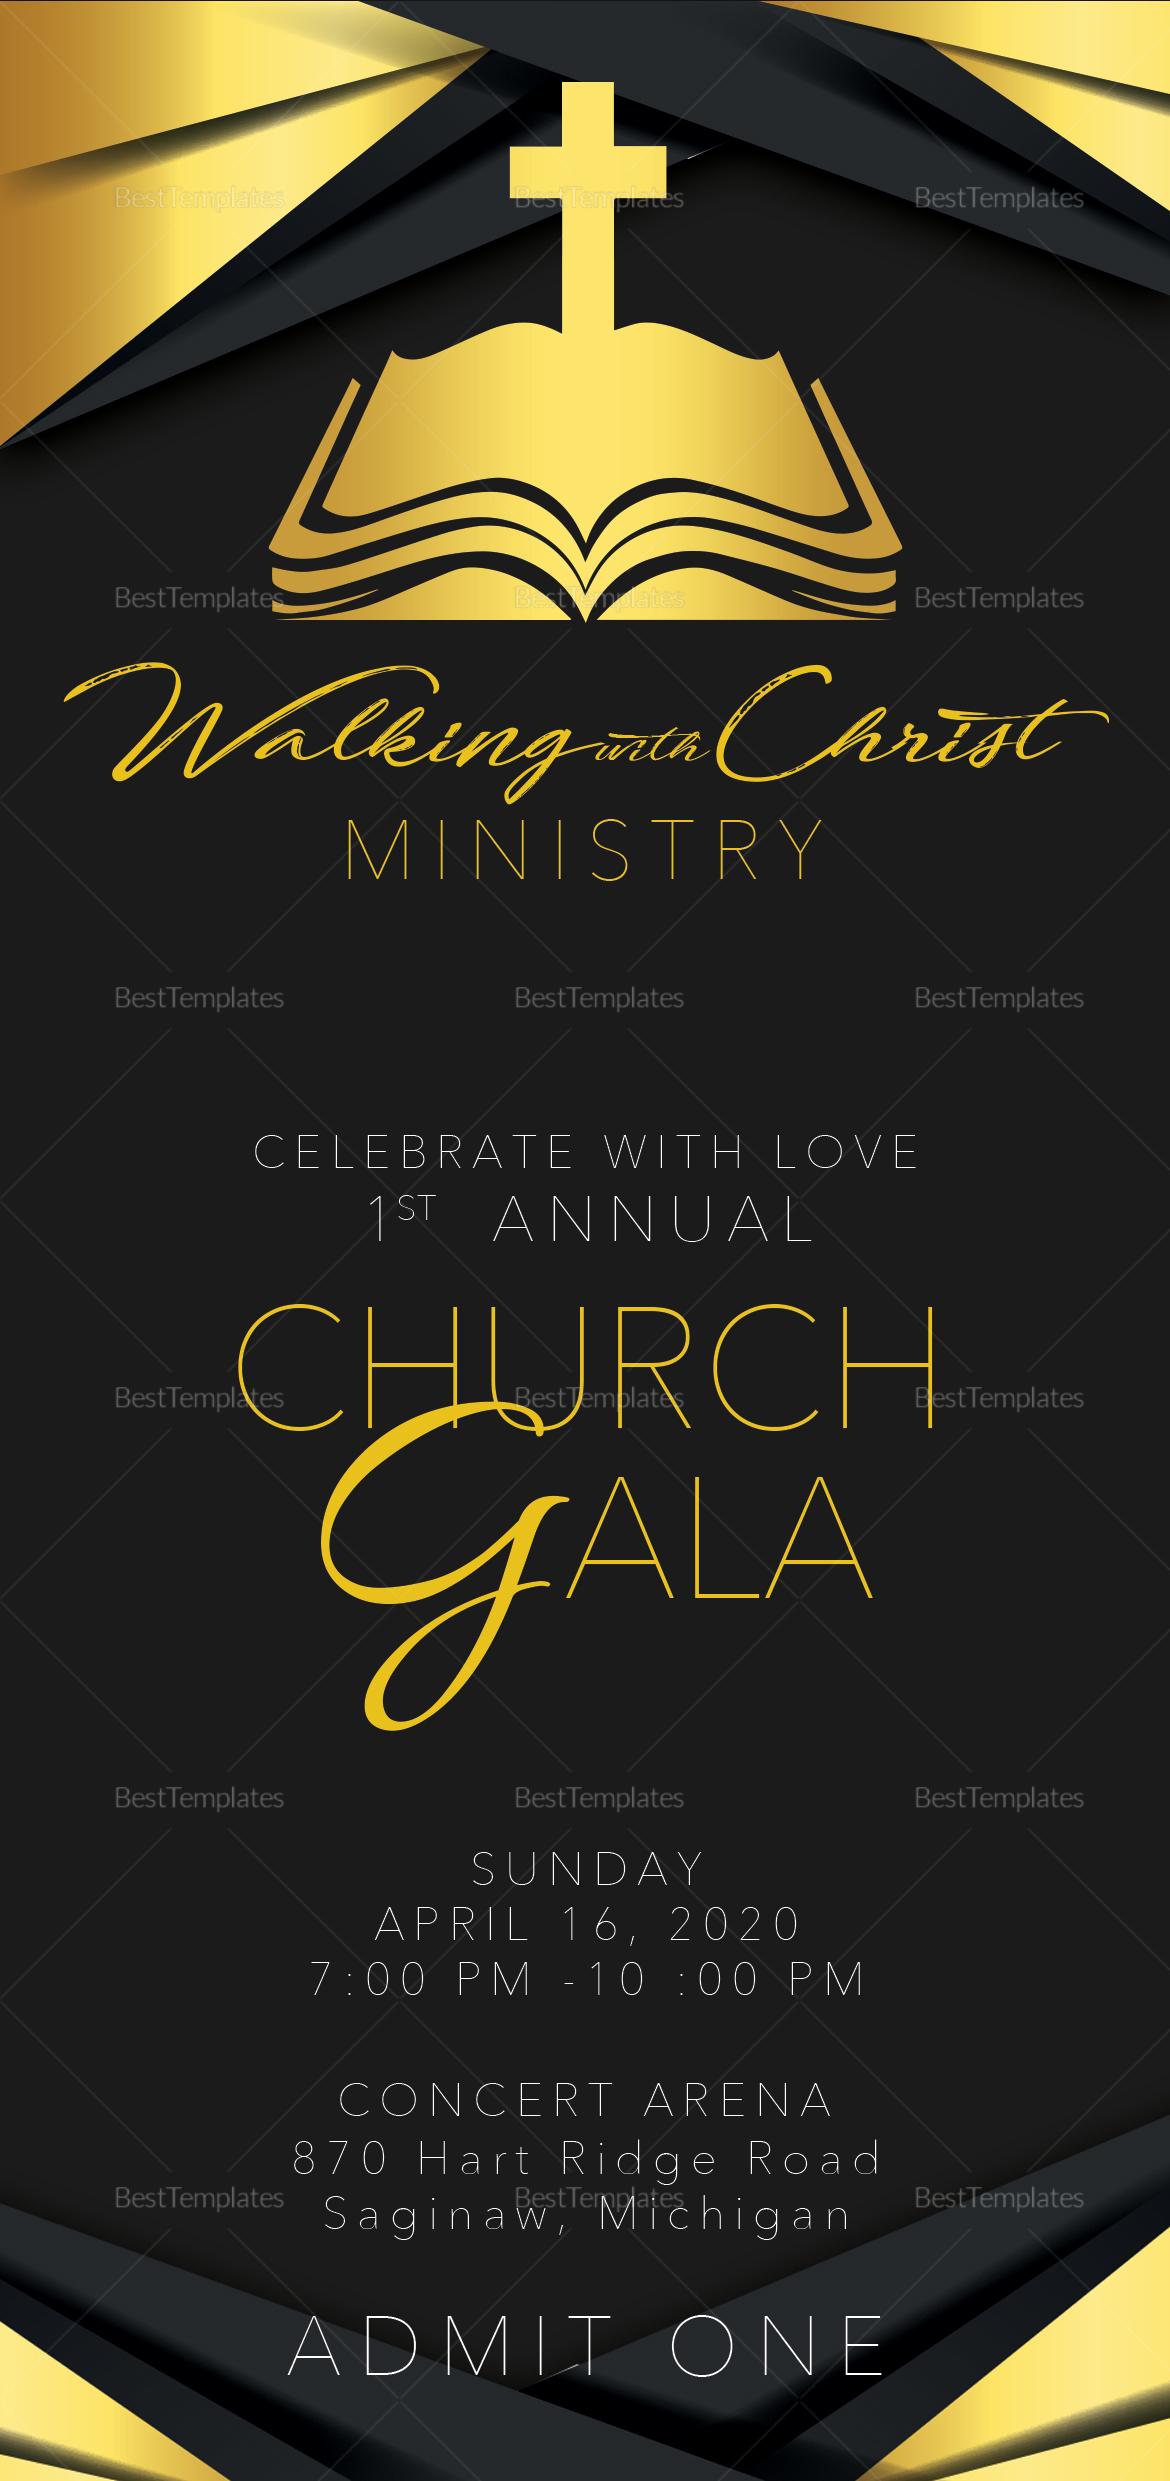 Church Gala